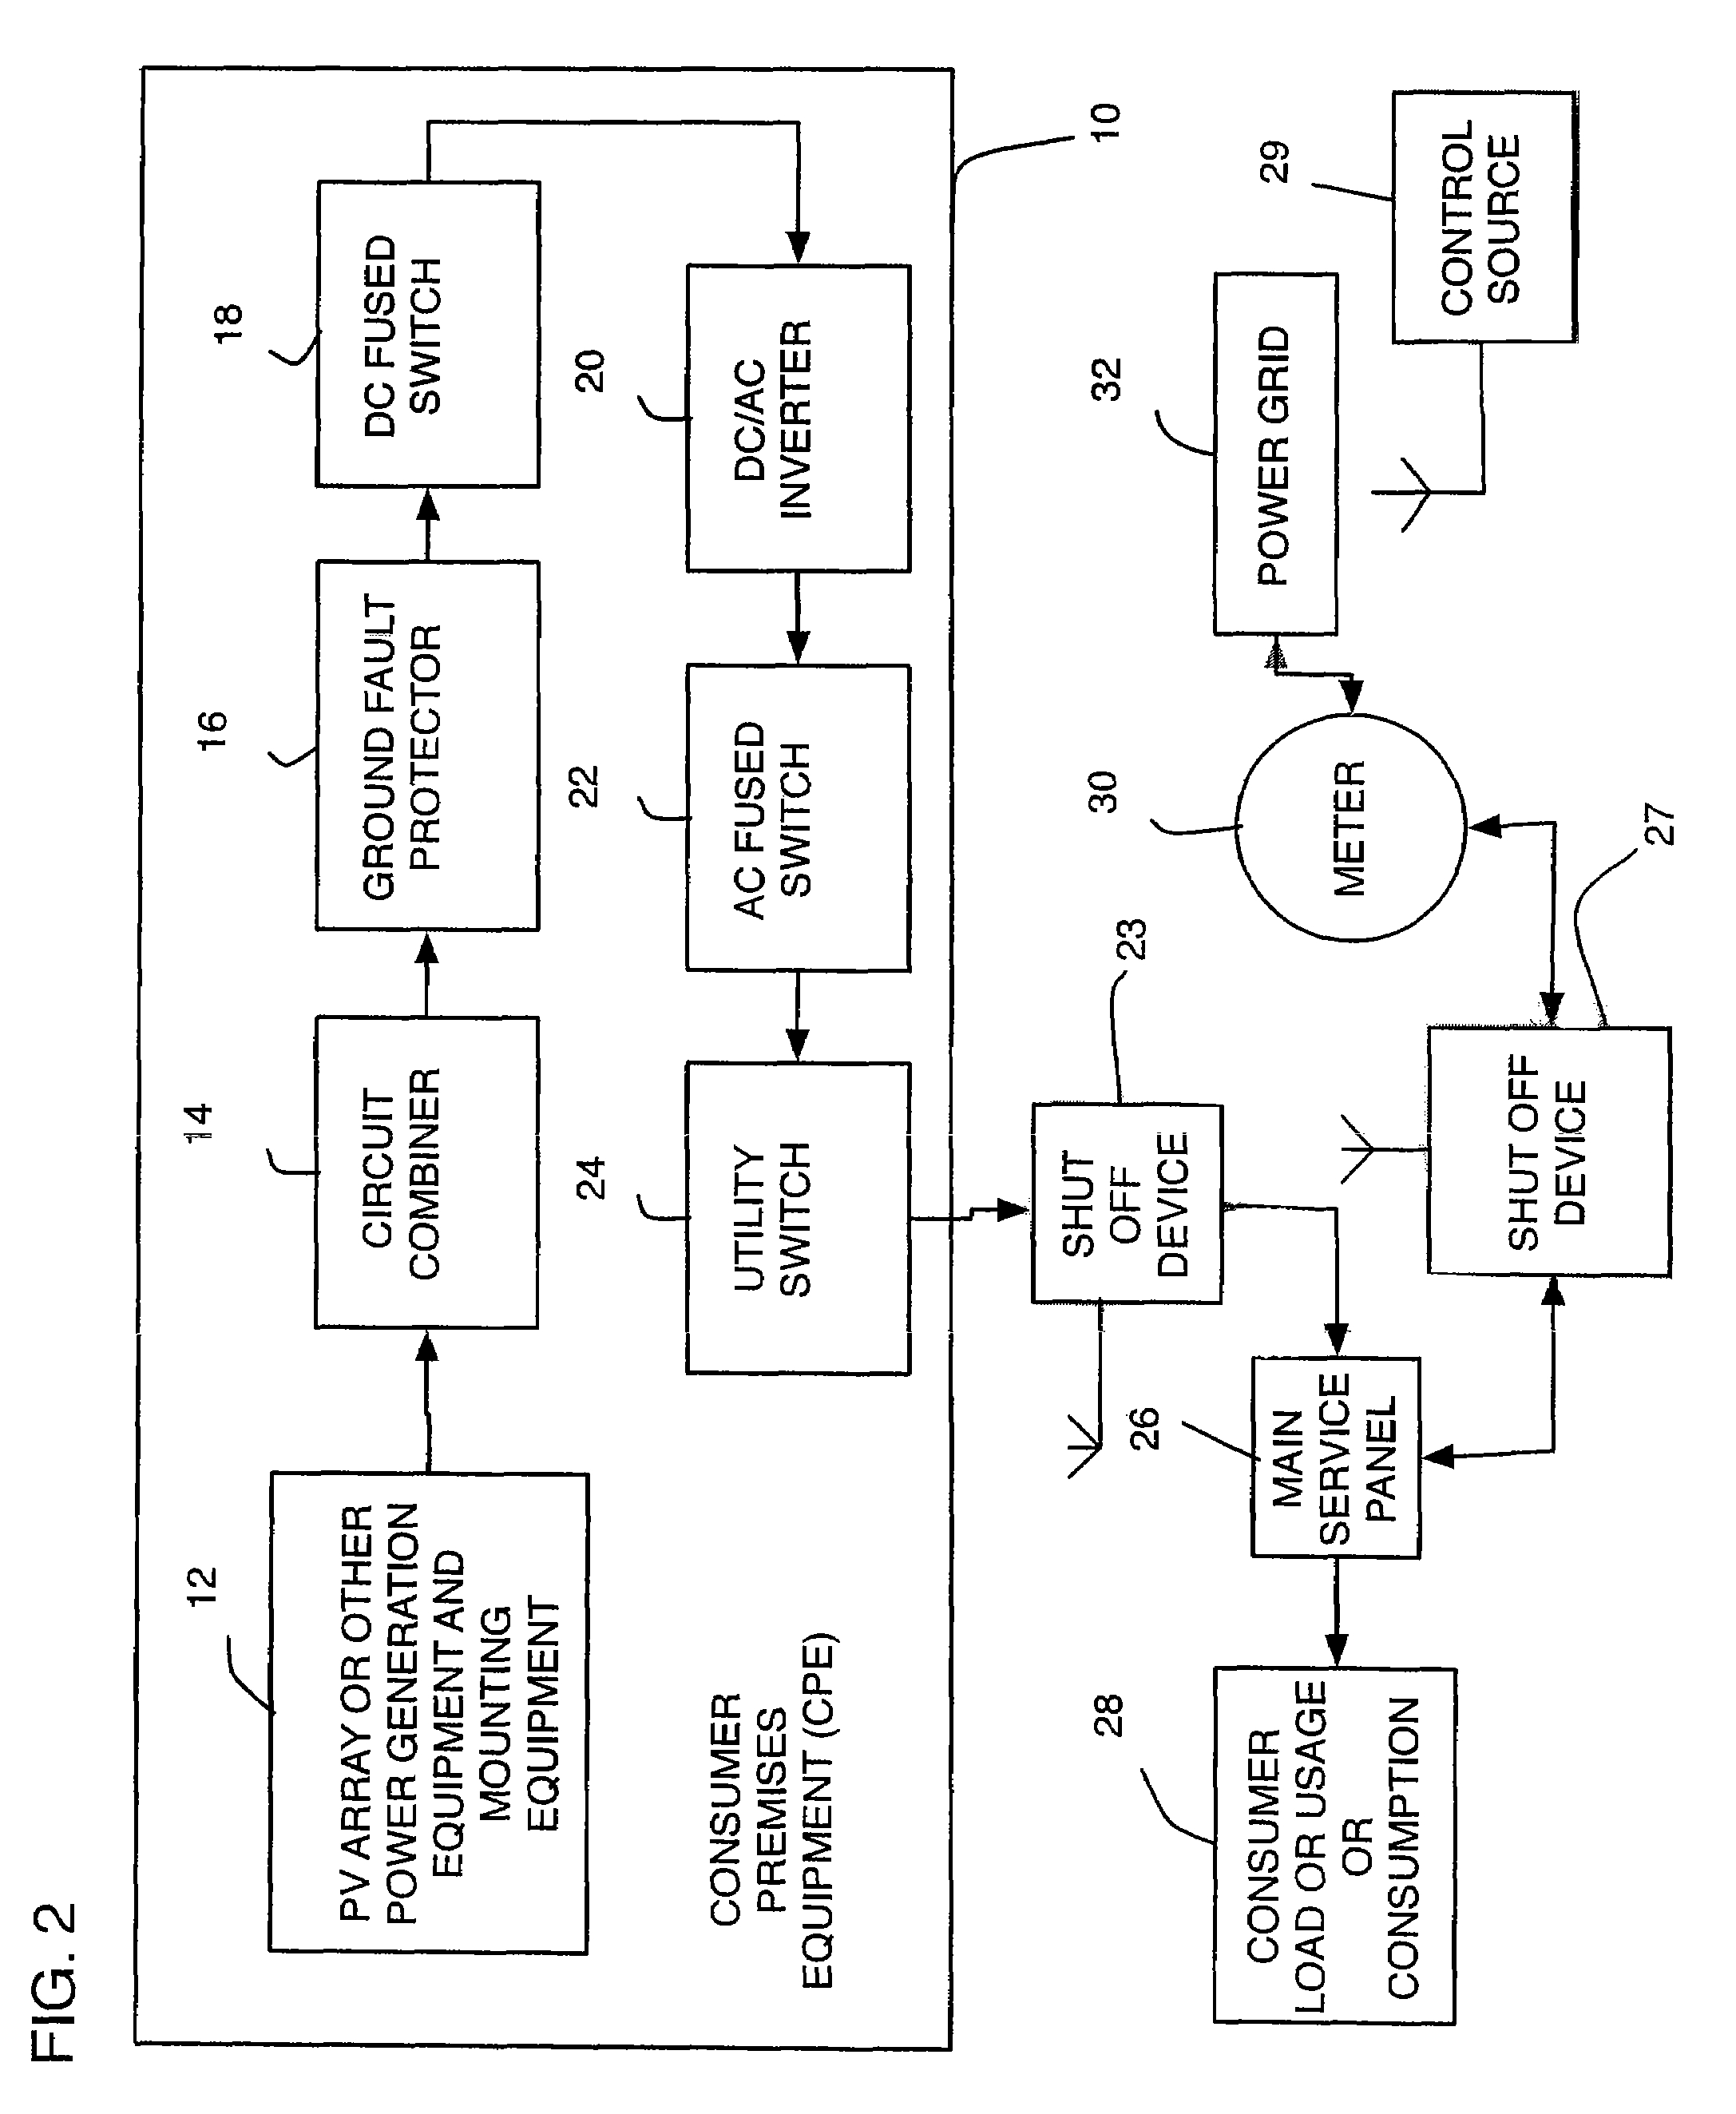 garmin aera 660 wiring diagram